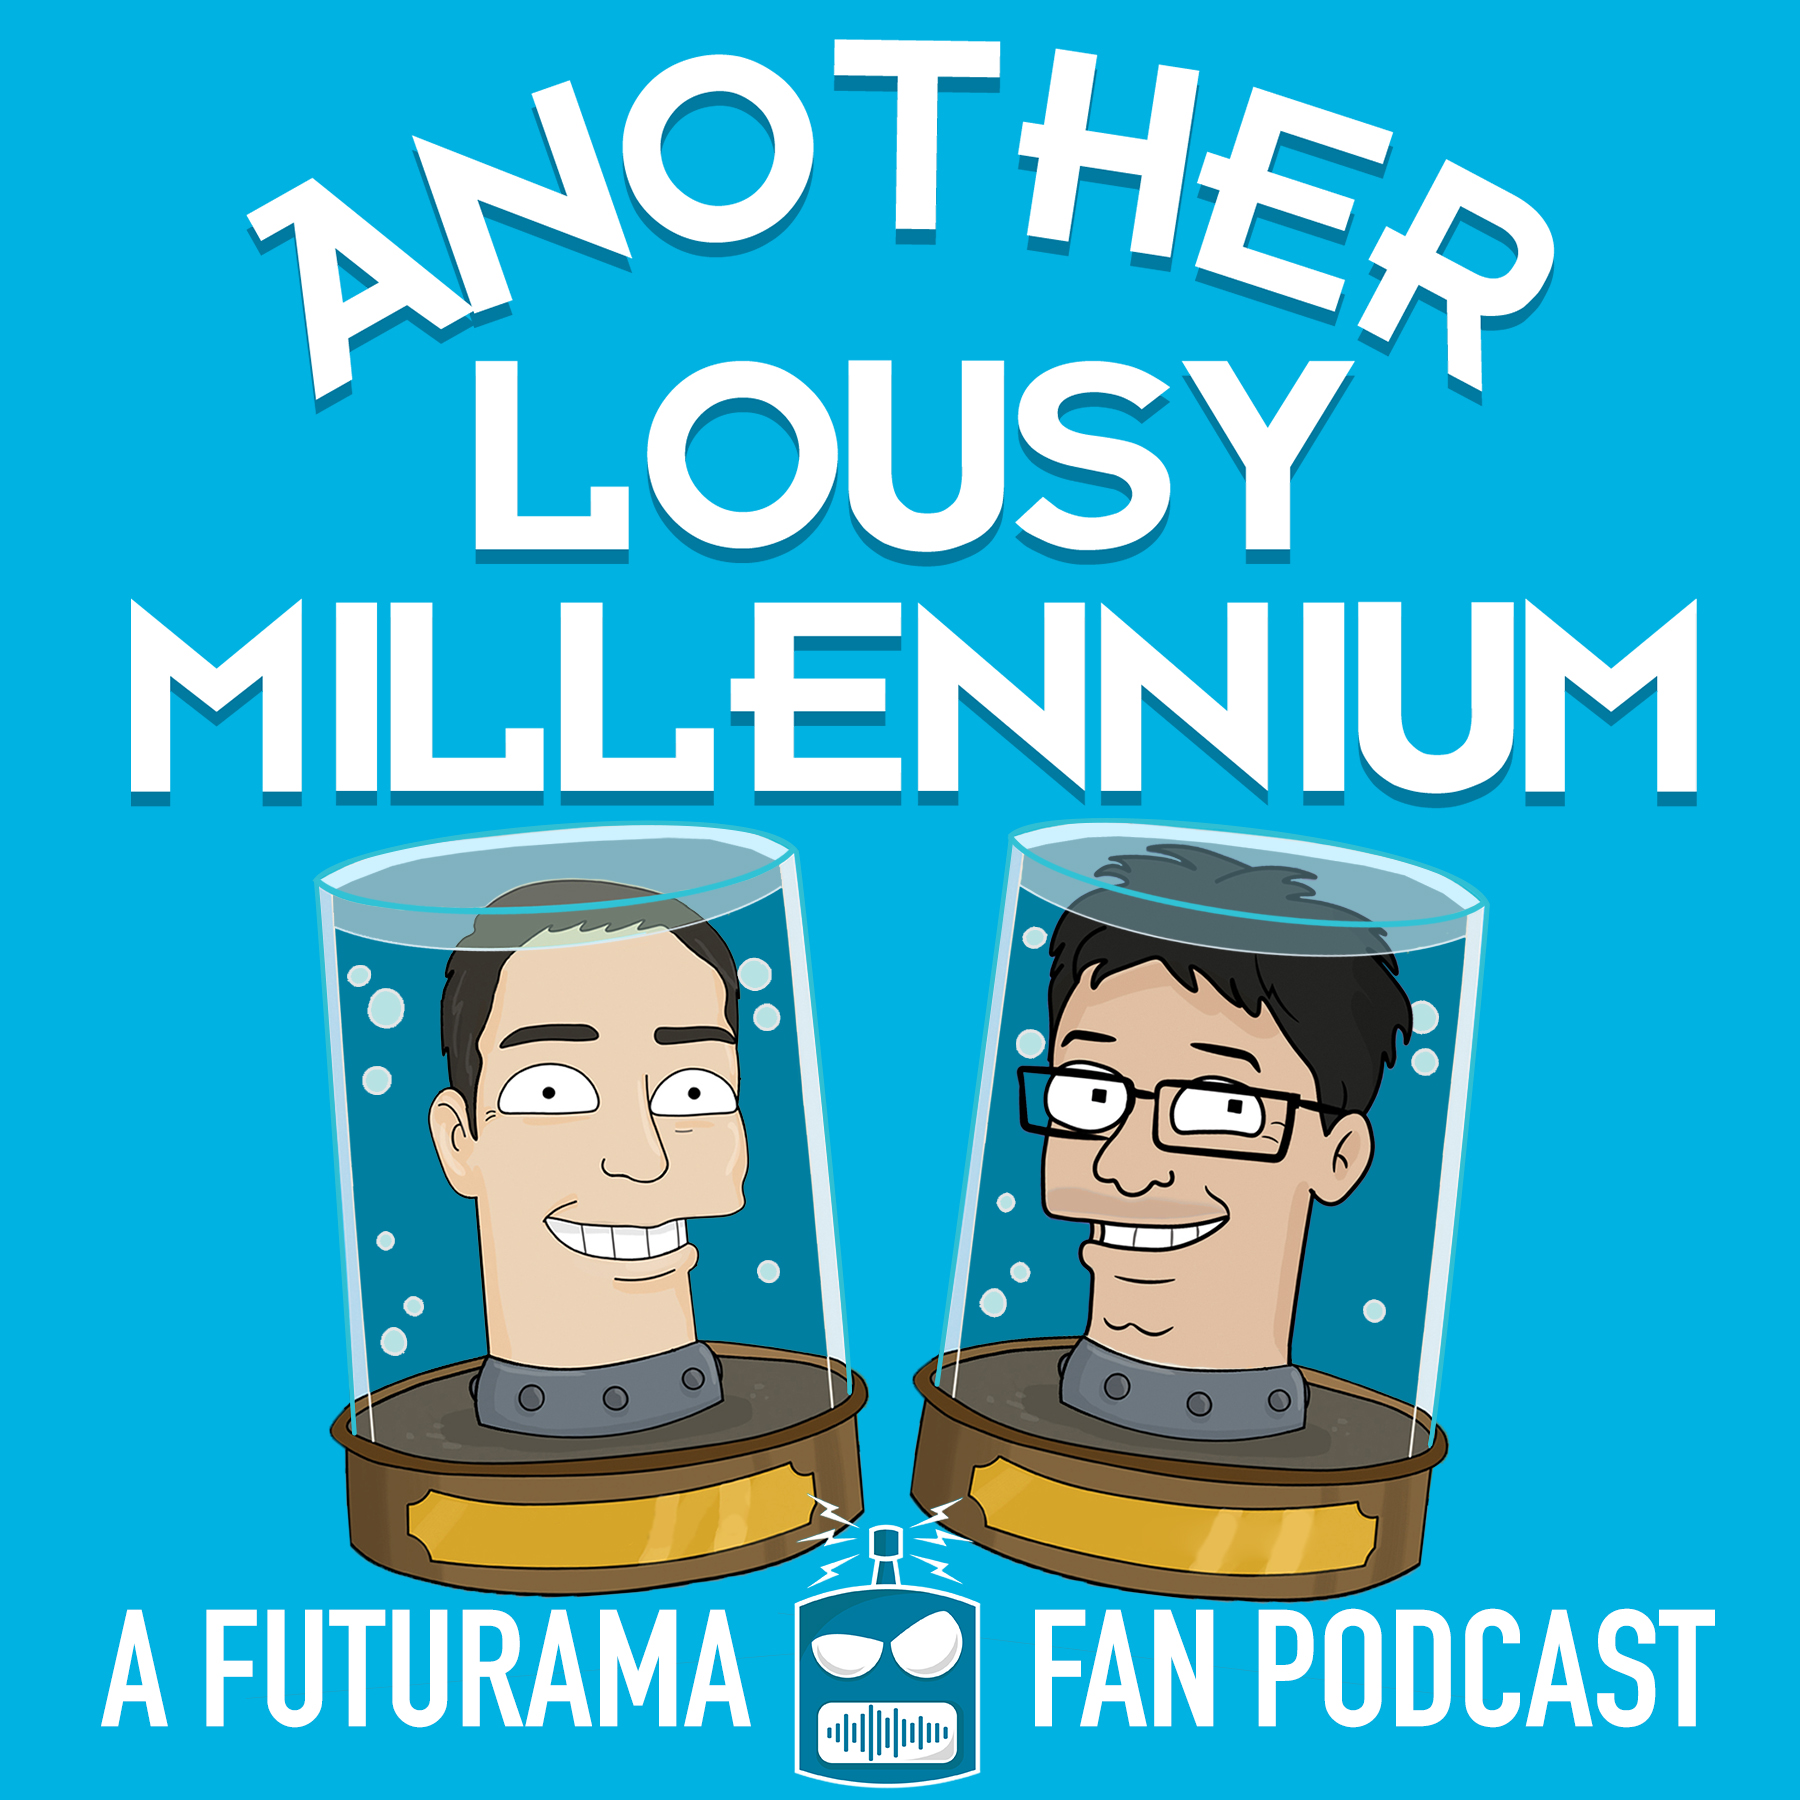 Another Lousy Millennium: A Futurama Fan Podcast show art